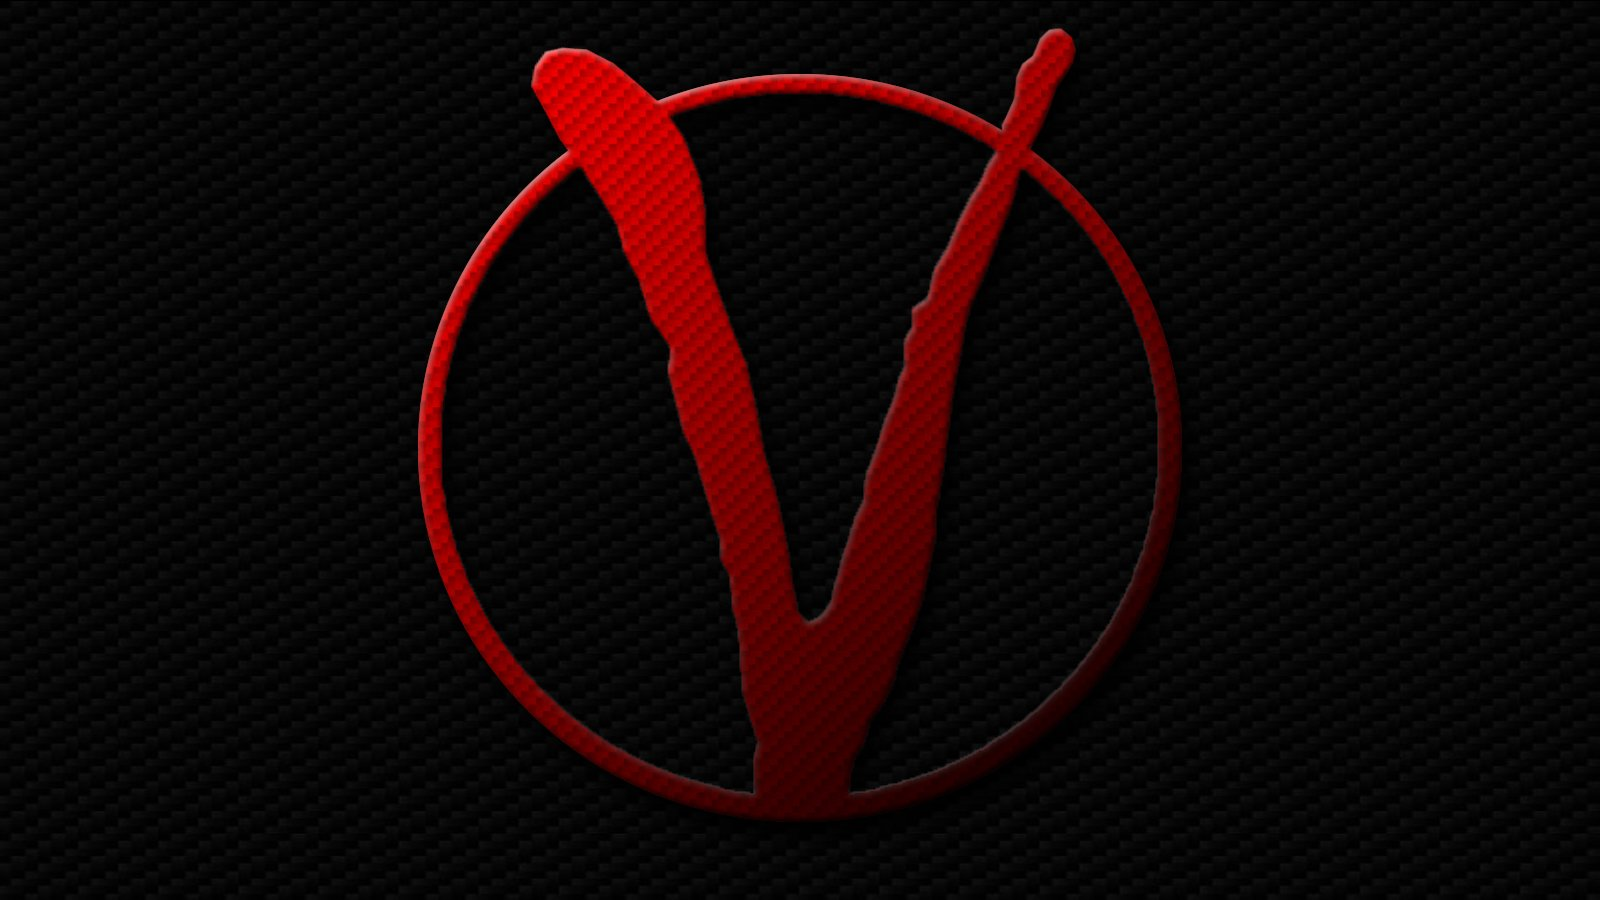 v for vendetta themes essay